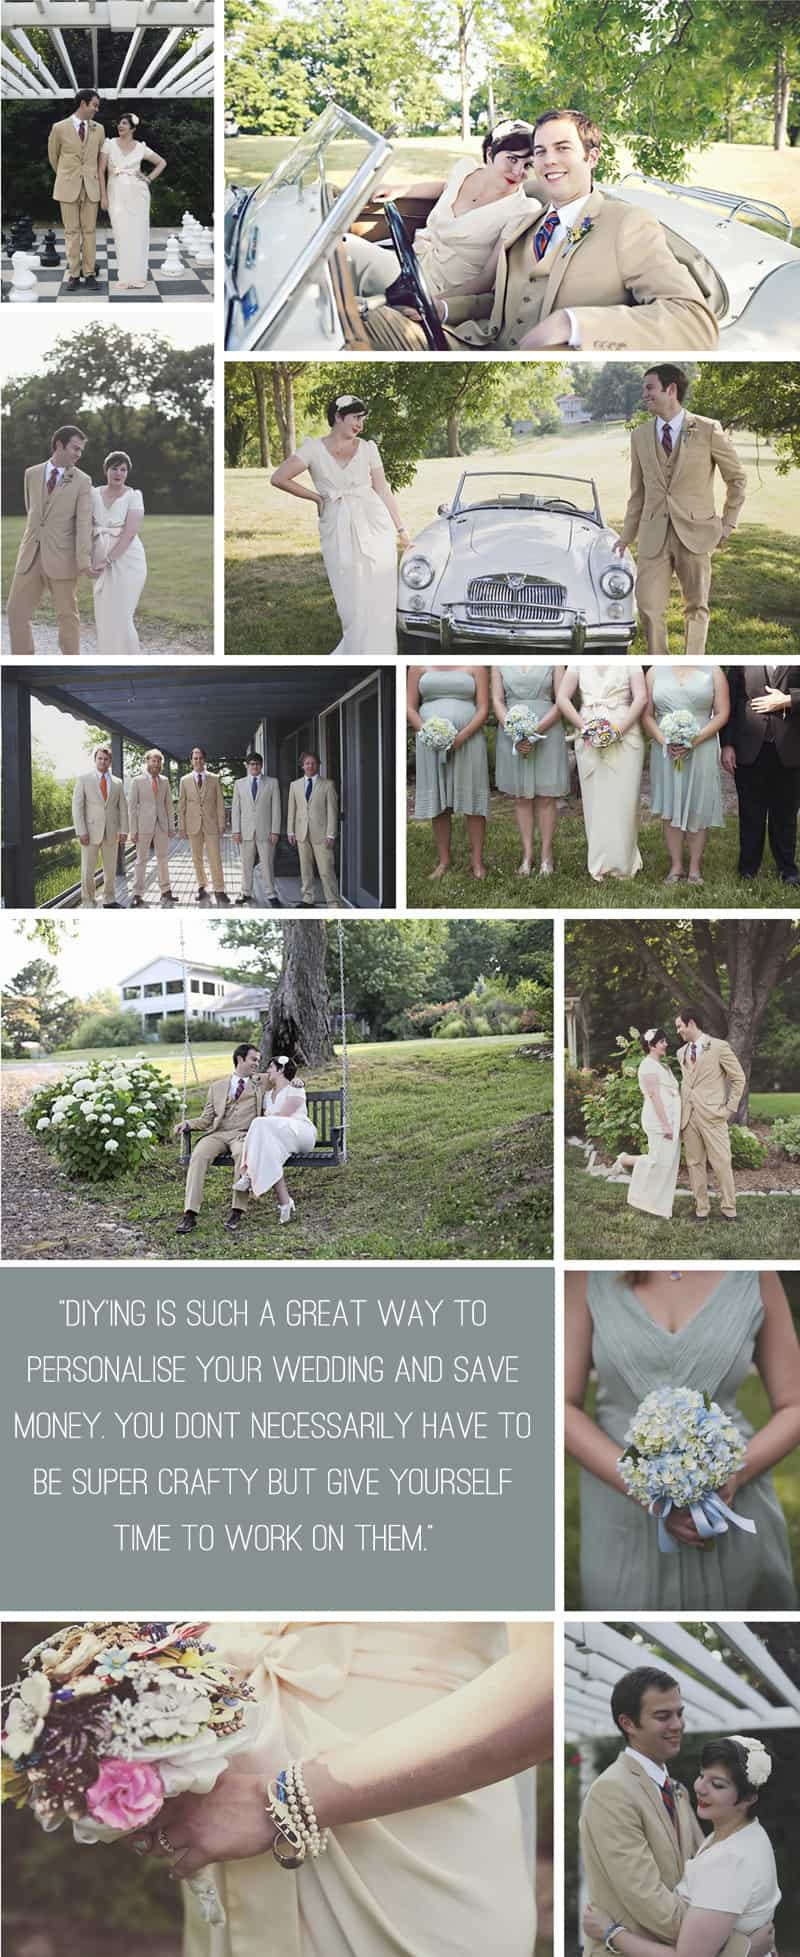 Dinosaur themed wedding - moondance photography 3